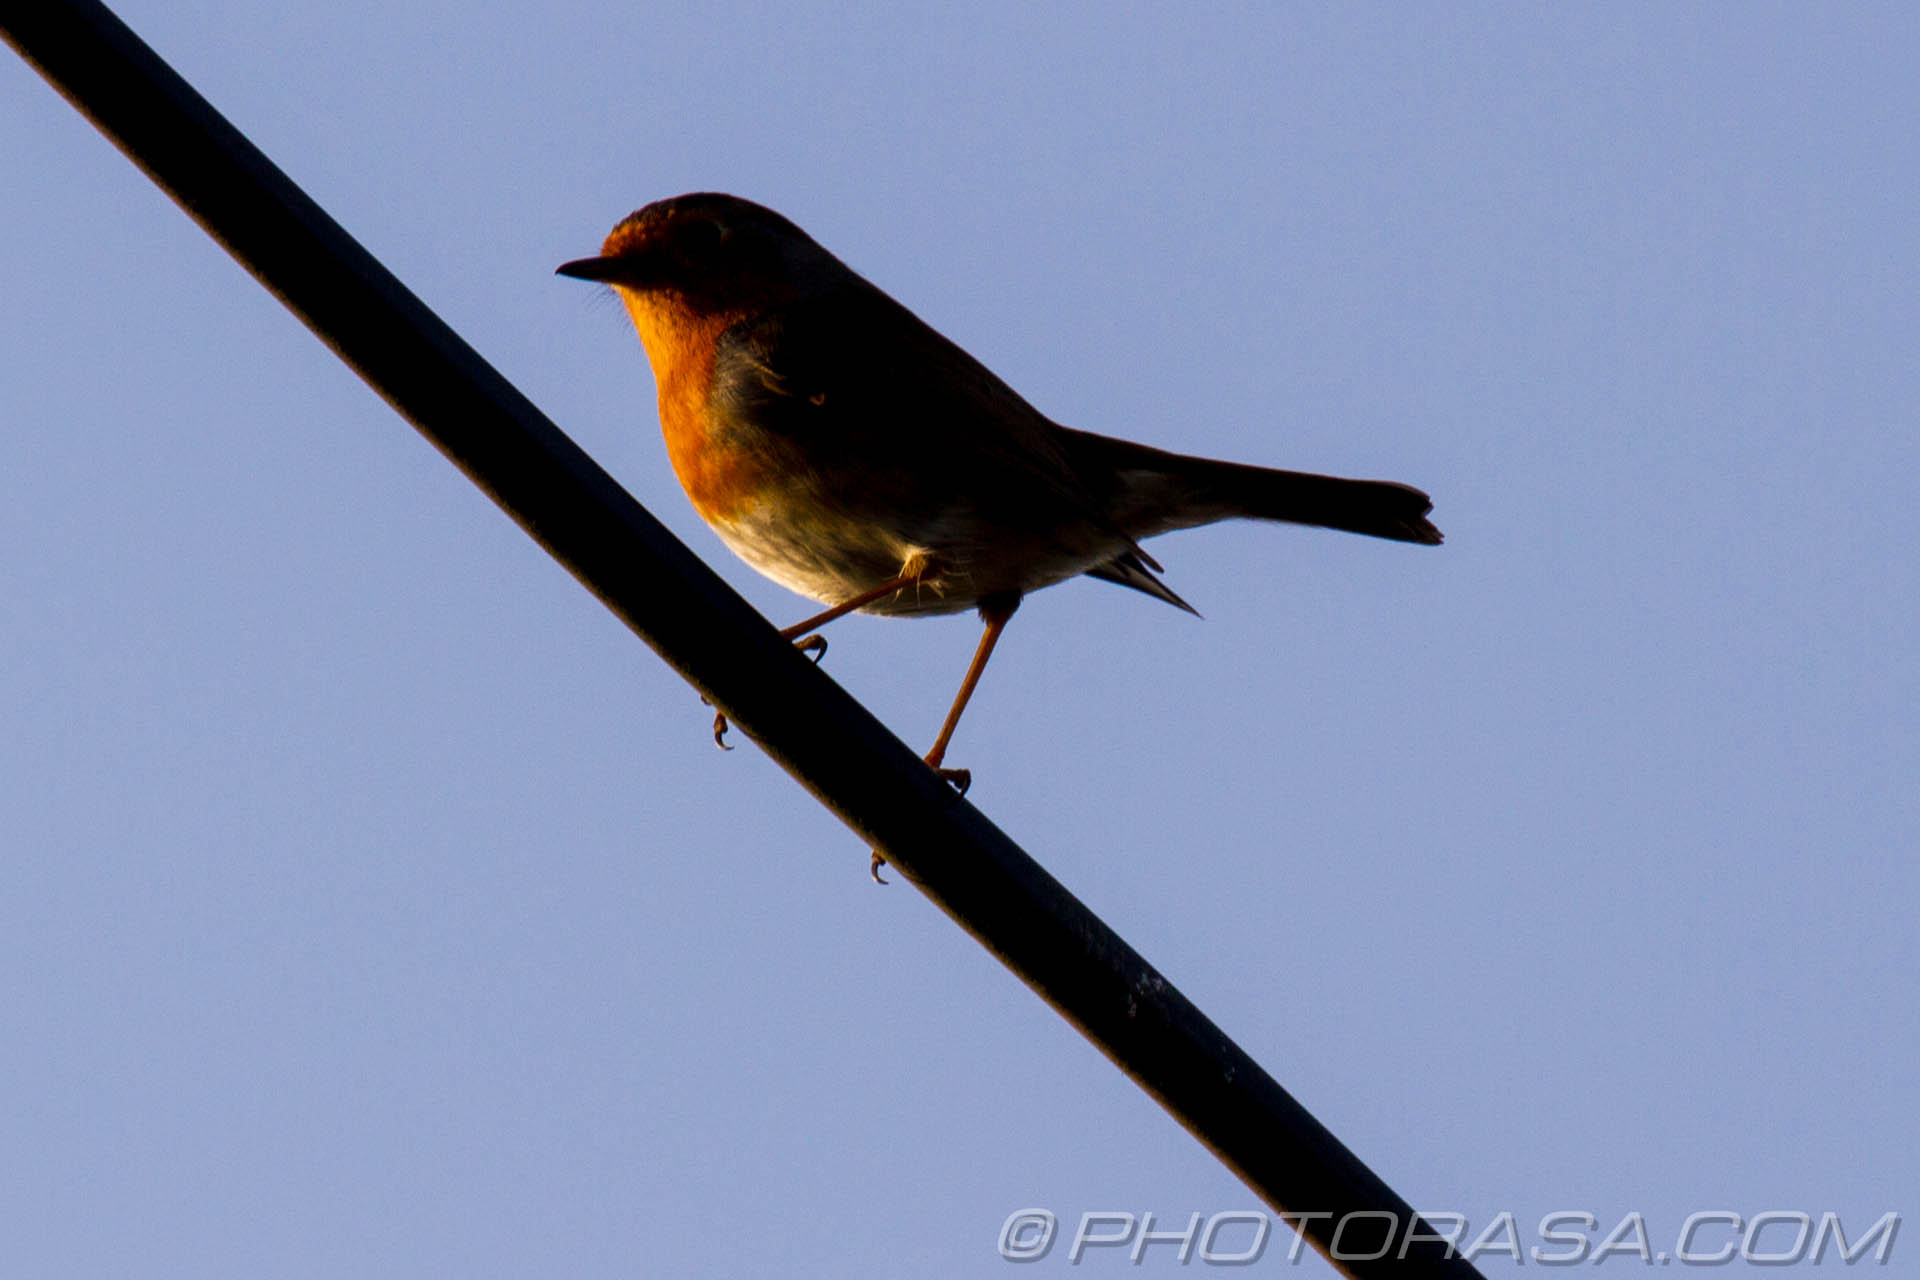 https://photorasa.com/robins/robin-on-telephone-line/